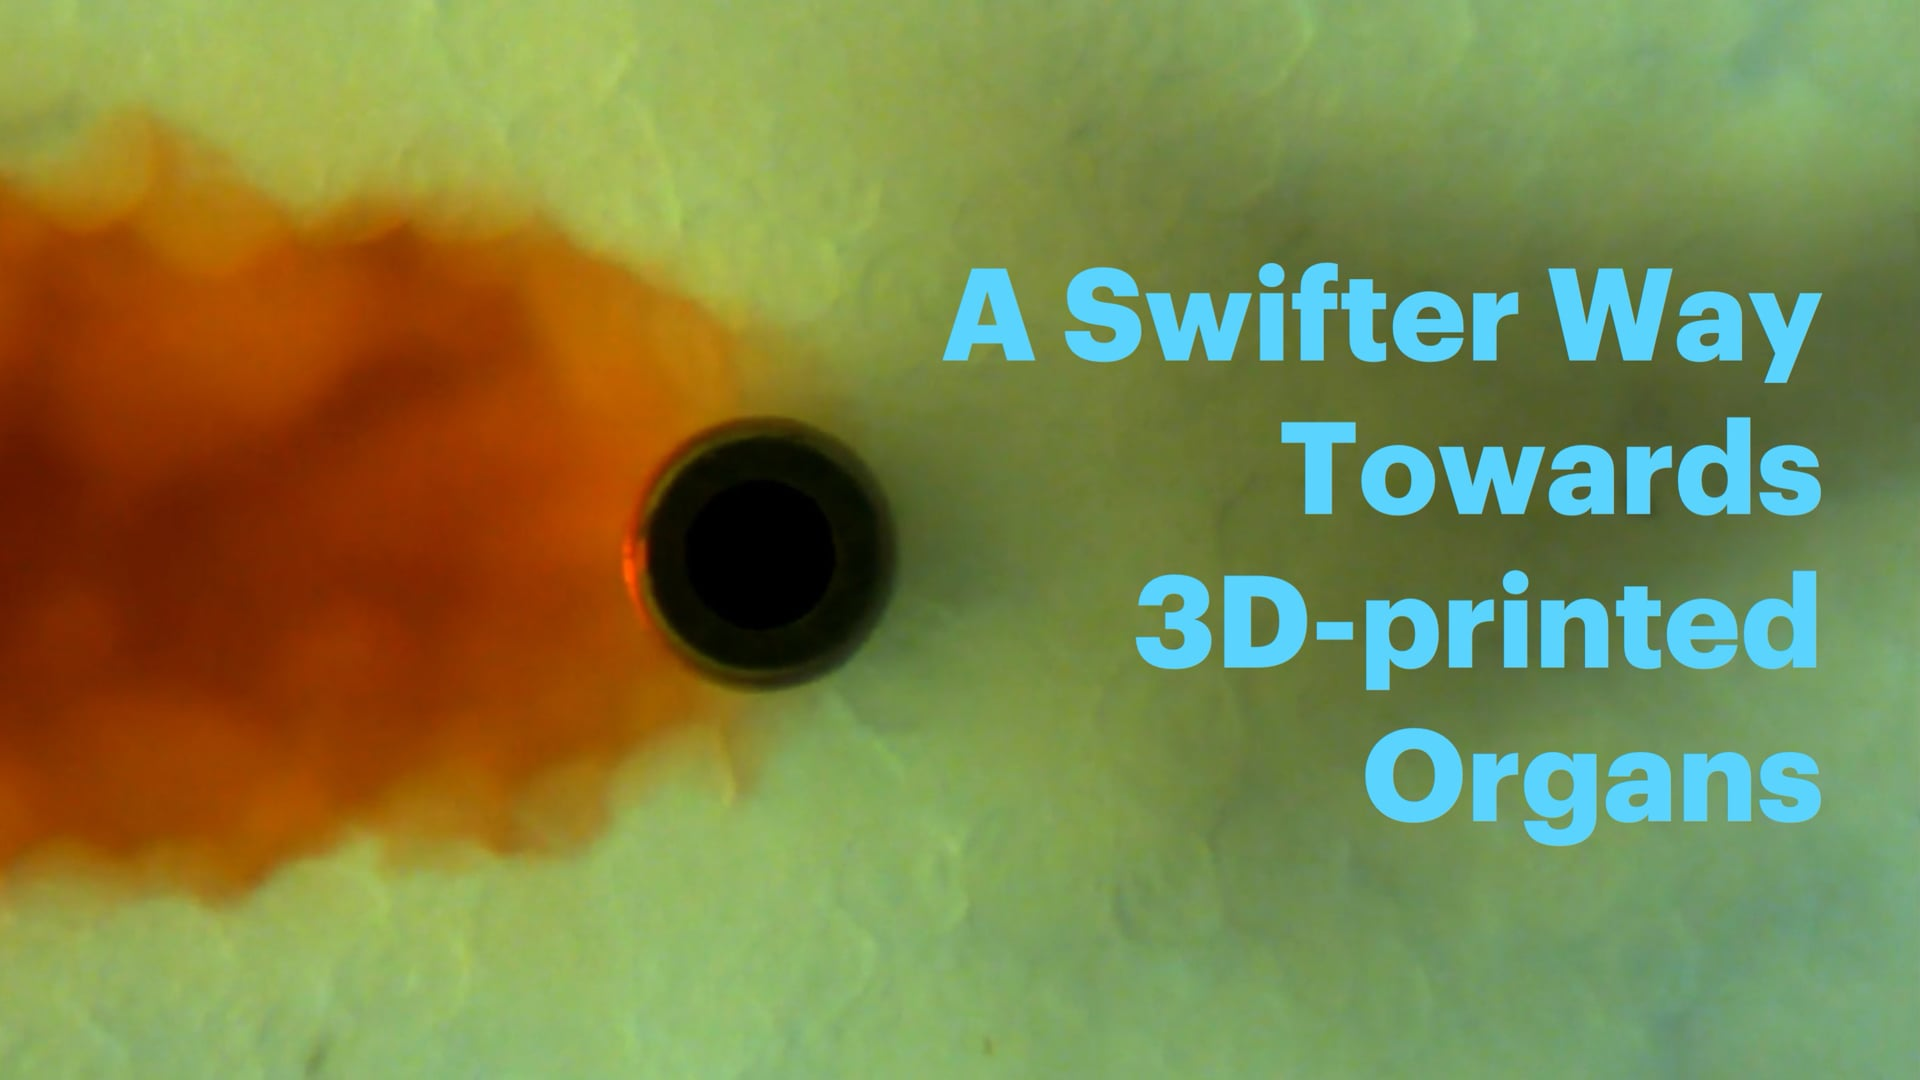 A Swifter Way Towards 3D-printed Organs